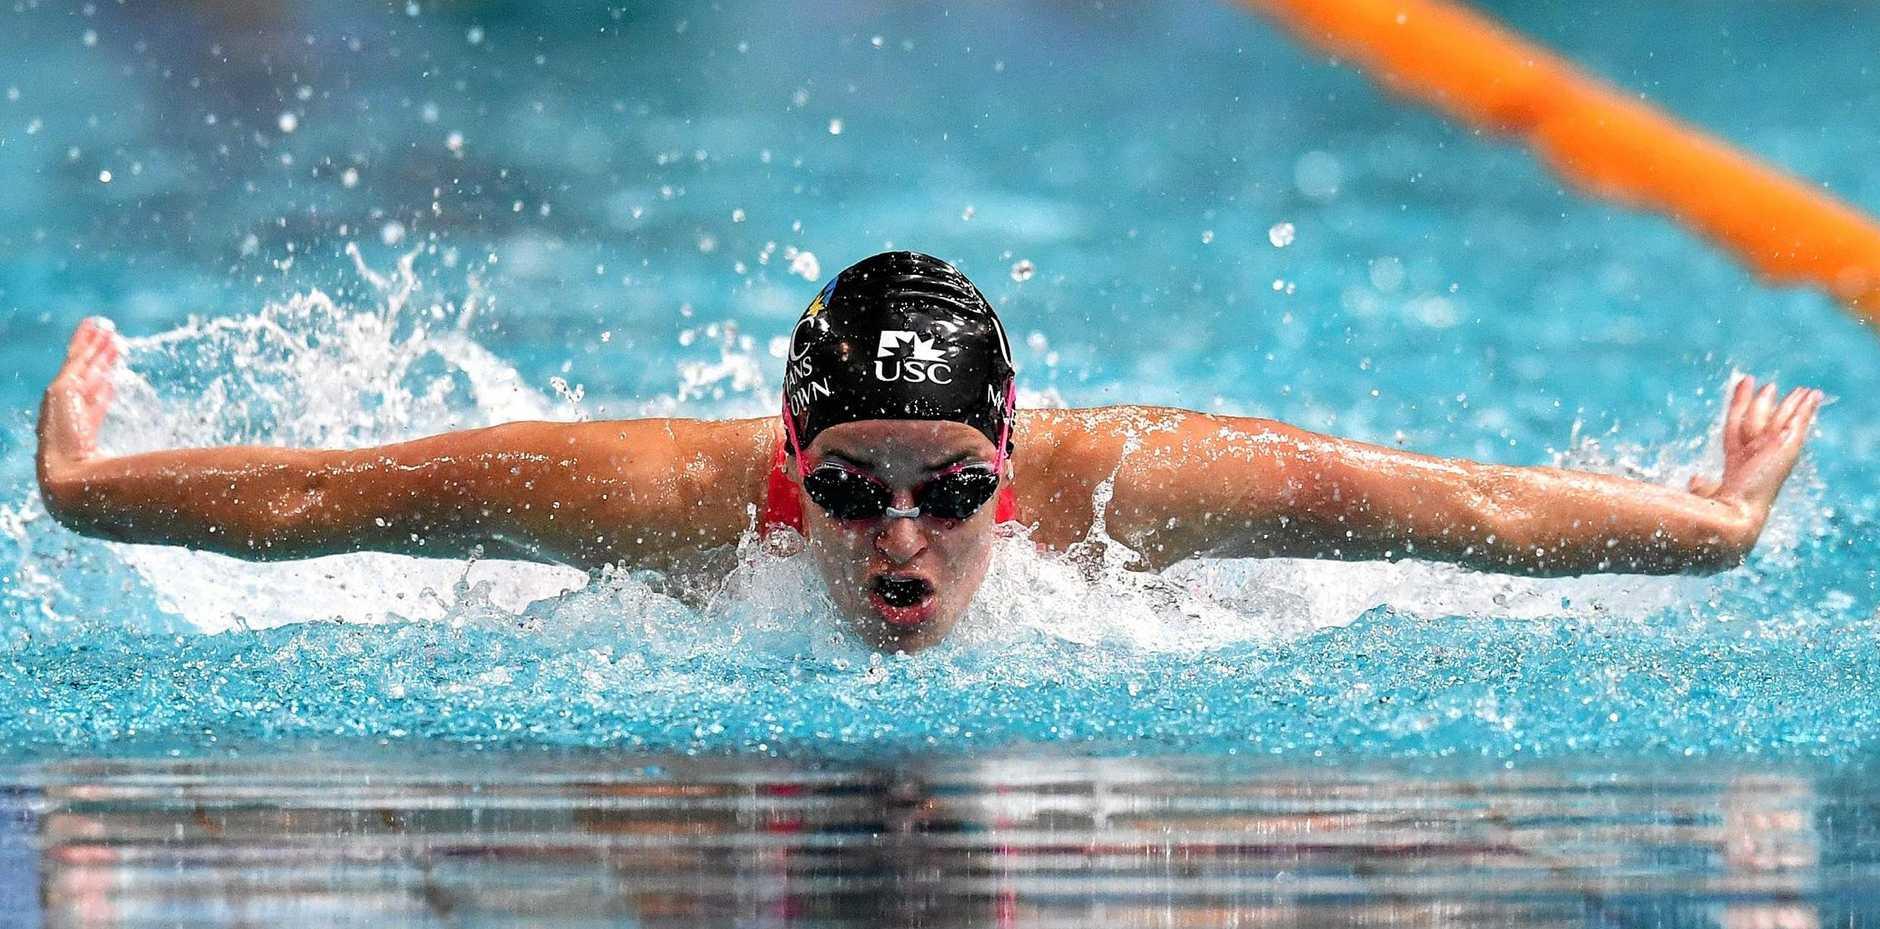 Sunshine Coast swimmer Kaylee McKeown is seen during the Women 200 metre IM event at the World Swimming Trials in Brisbane, Sunday, June 9, 2019.